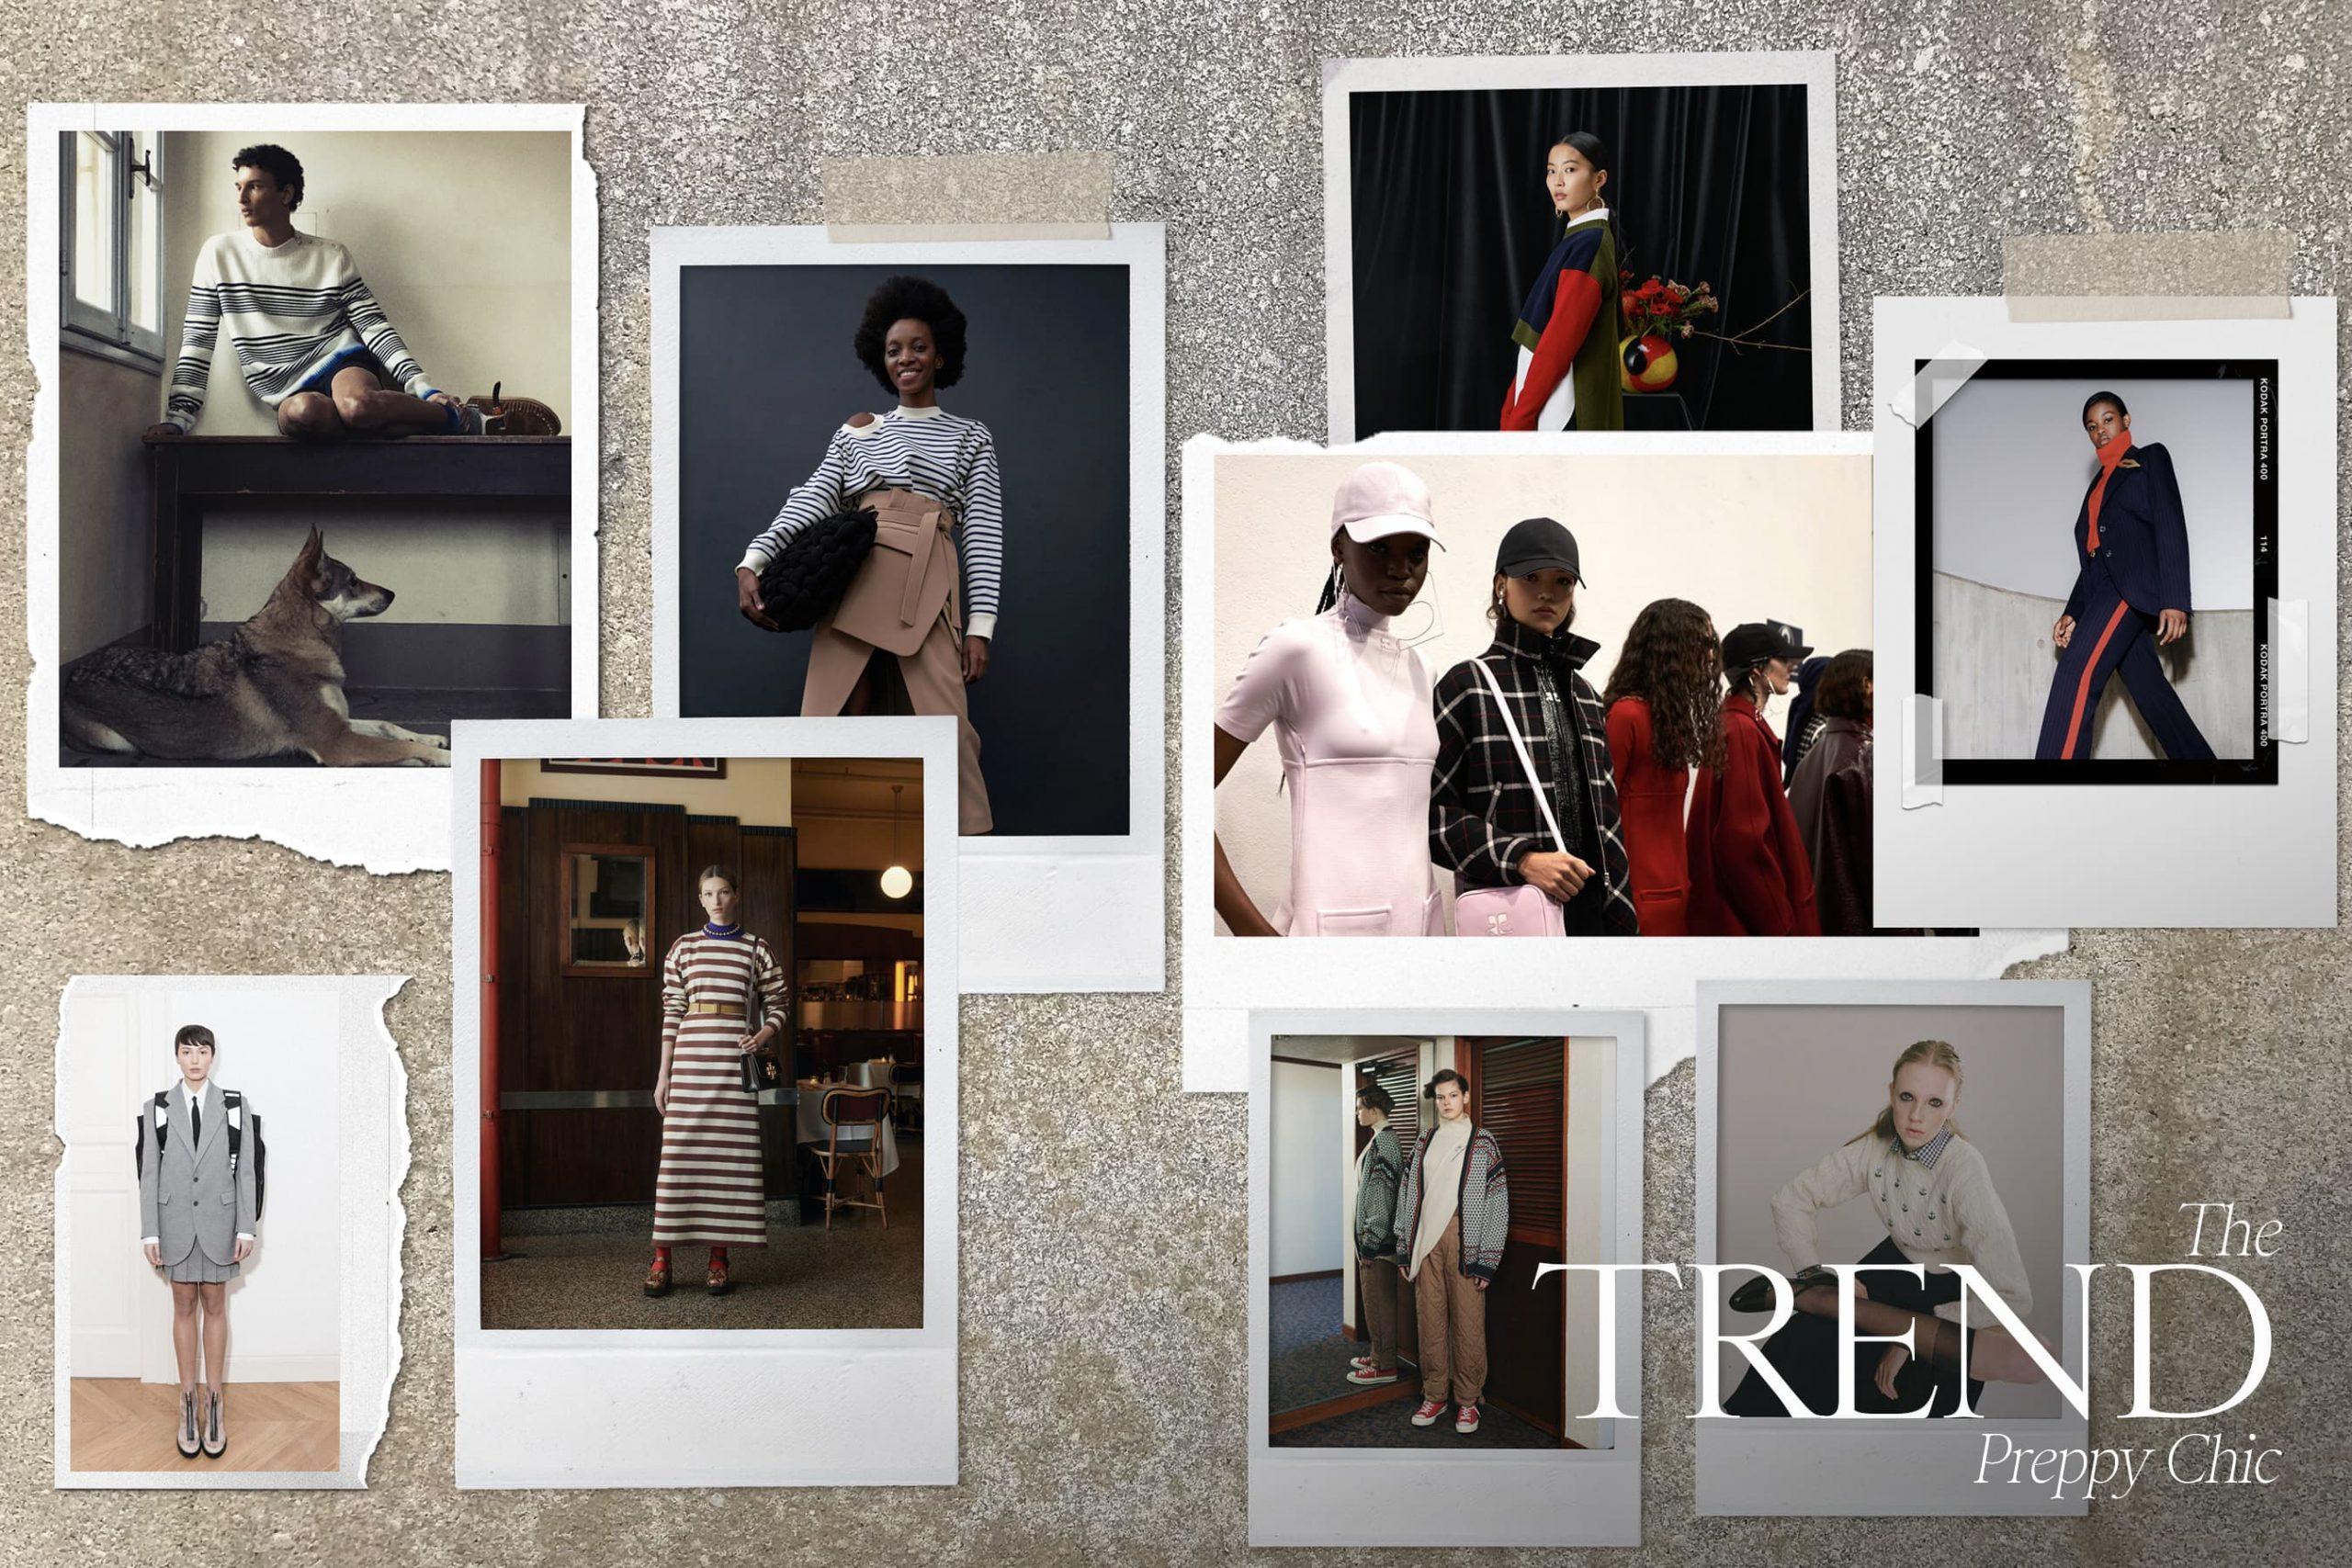 Preppy Chic Fall 2021 Fashion Trend